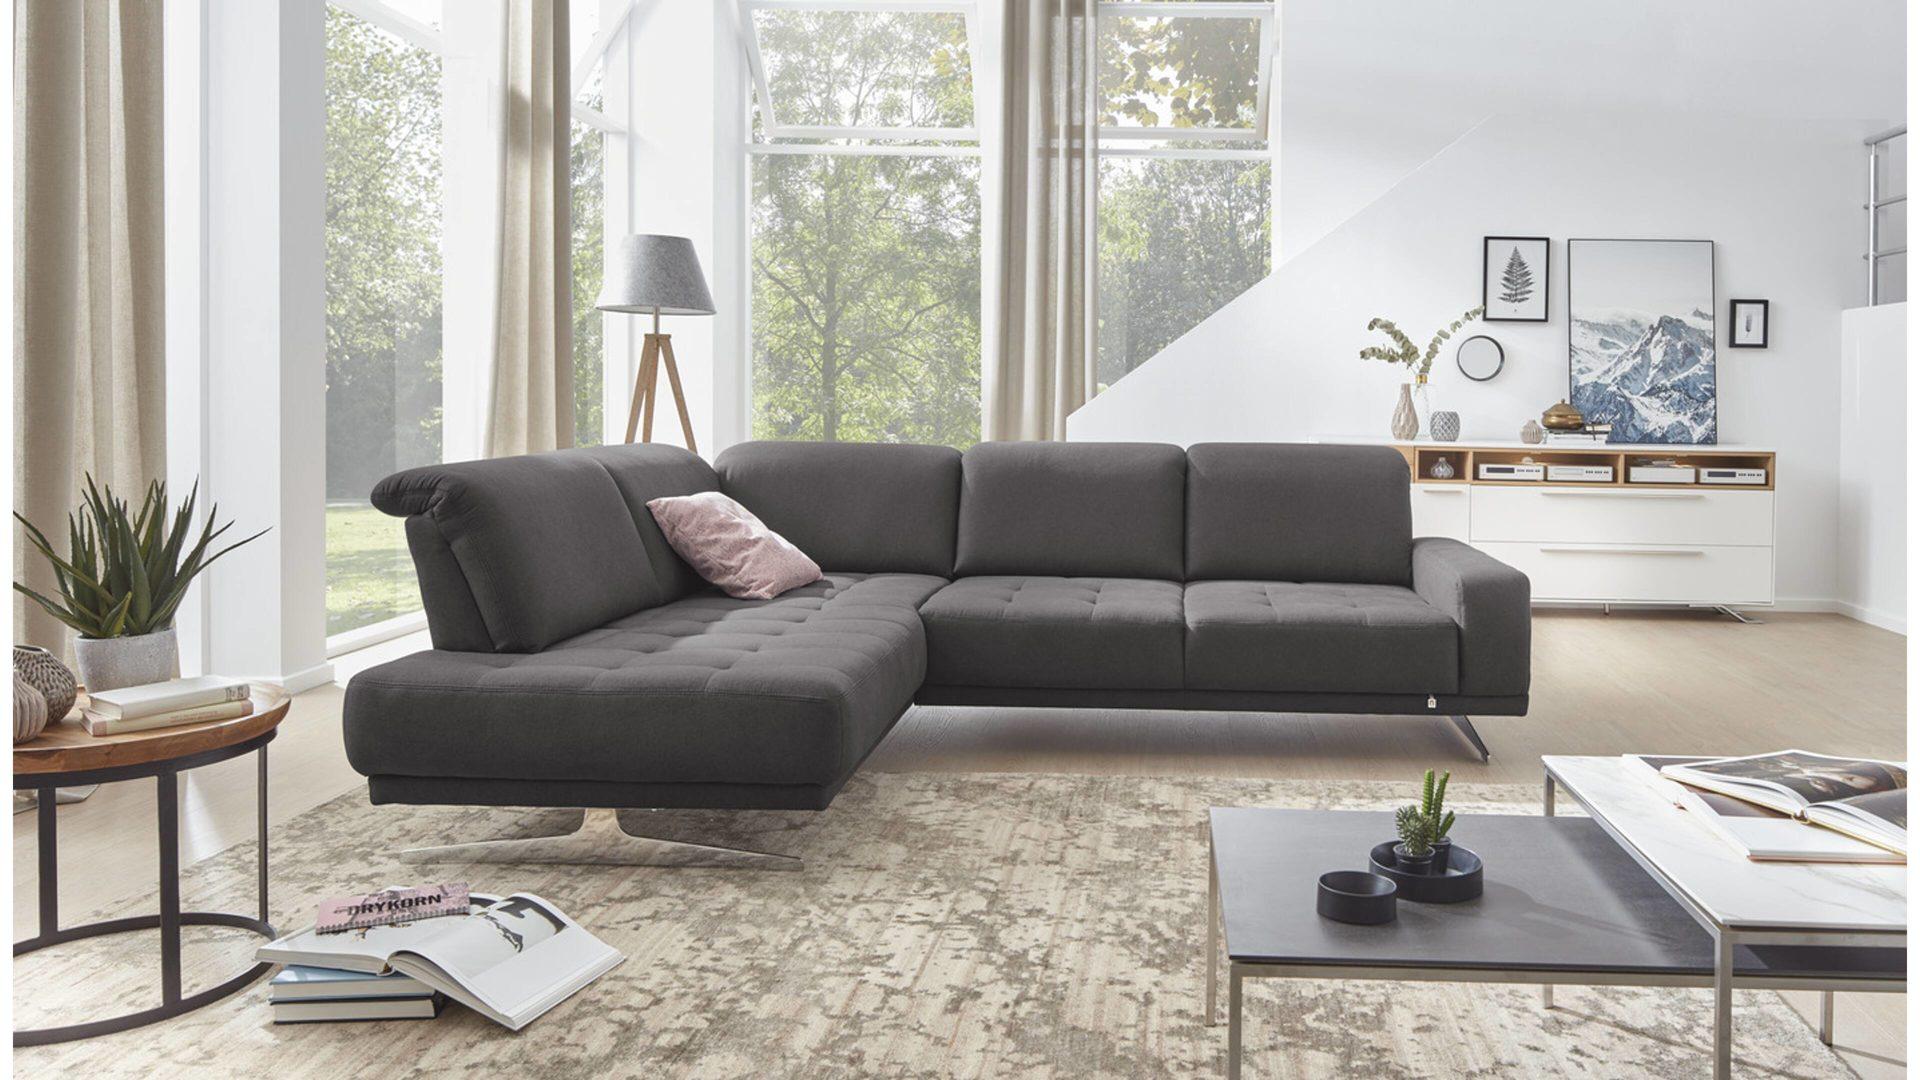 Interliving Sofa Serie 4250 Eckkombination Anthrazitfarbener